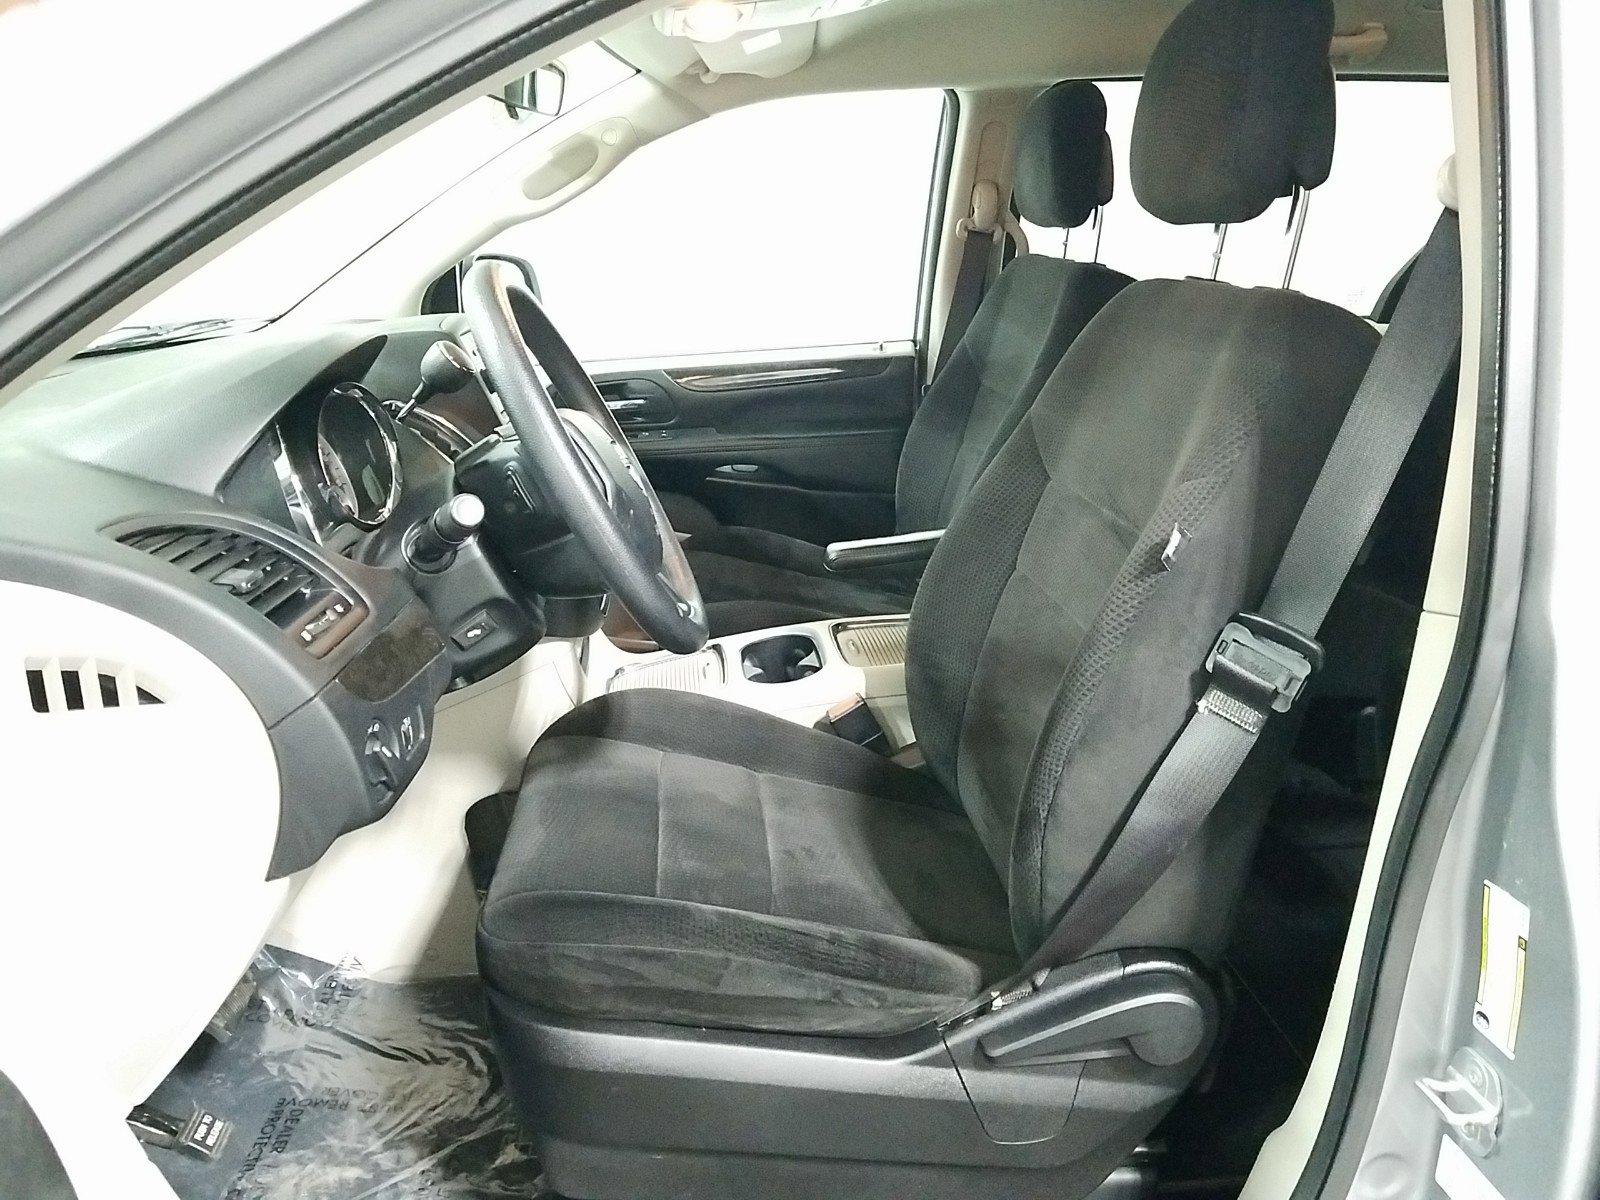 Pre-Owned 2013 Dodge Grand Caravan SXT